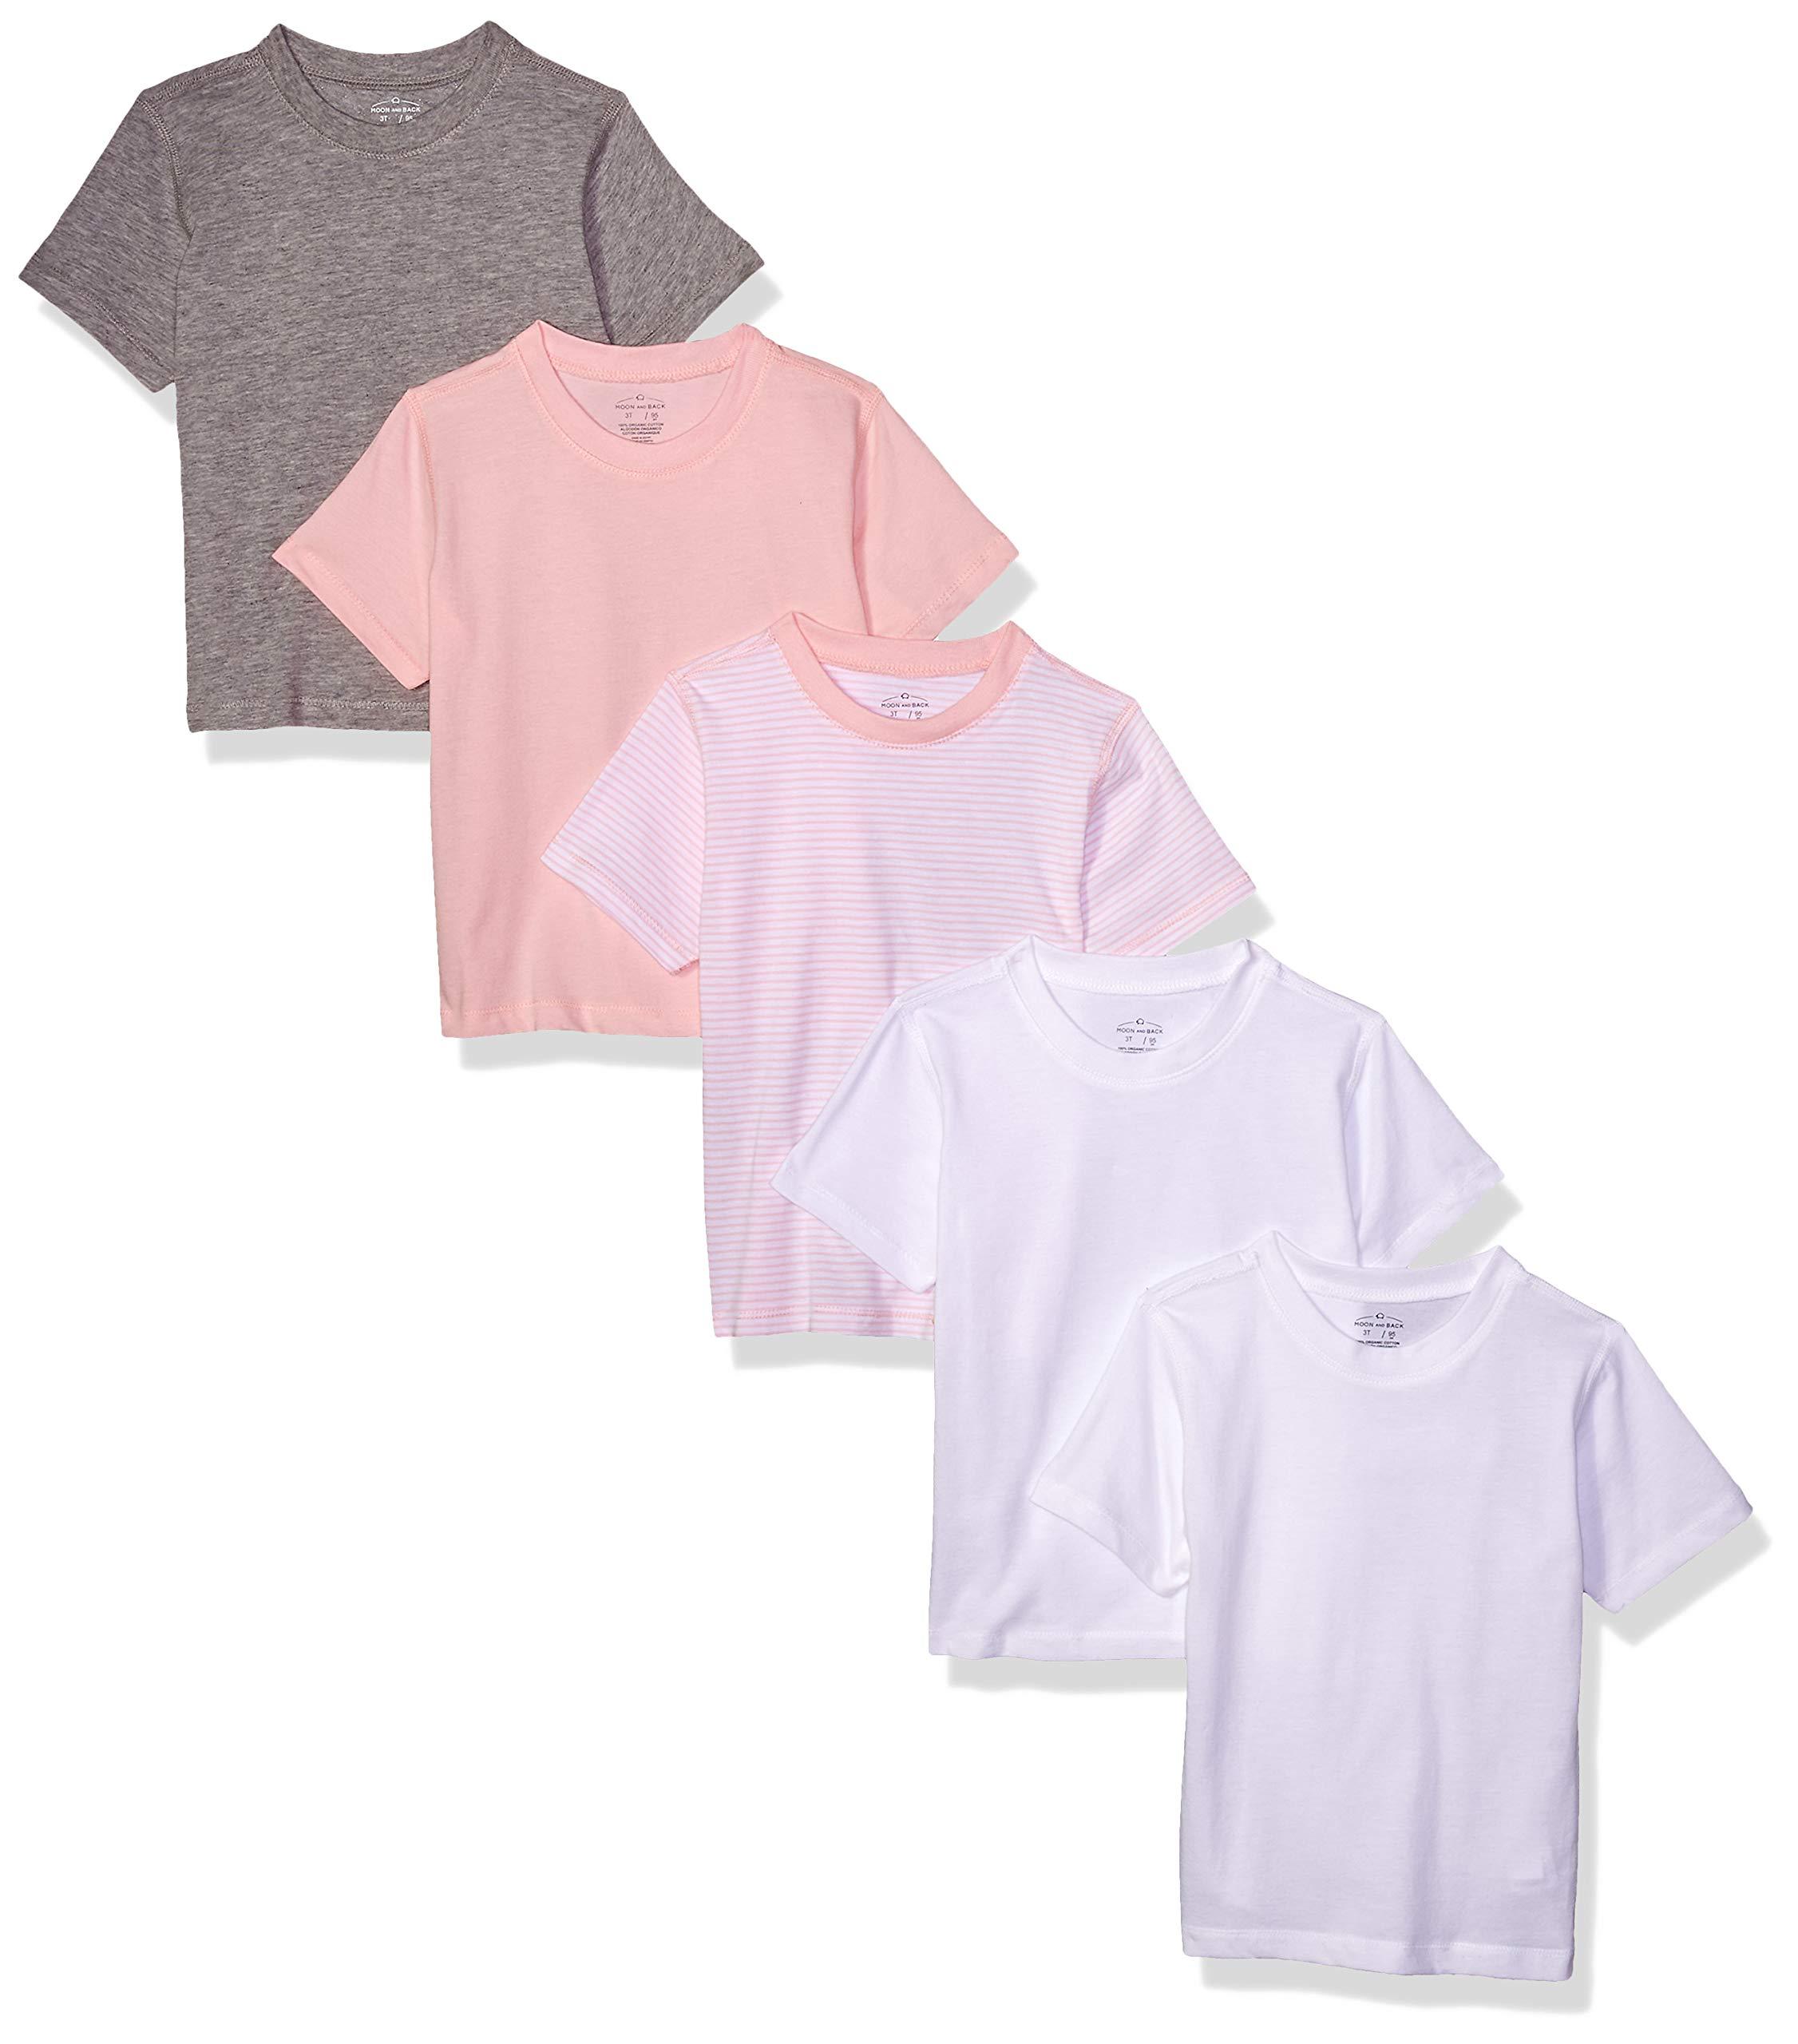 Moon and Back Toddler Set of 5 Organic Crew-Neck Short-Sleeve Tee Shirts, Pink Blush, 2T